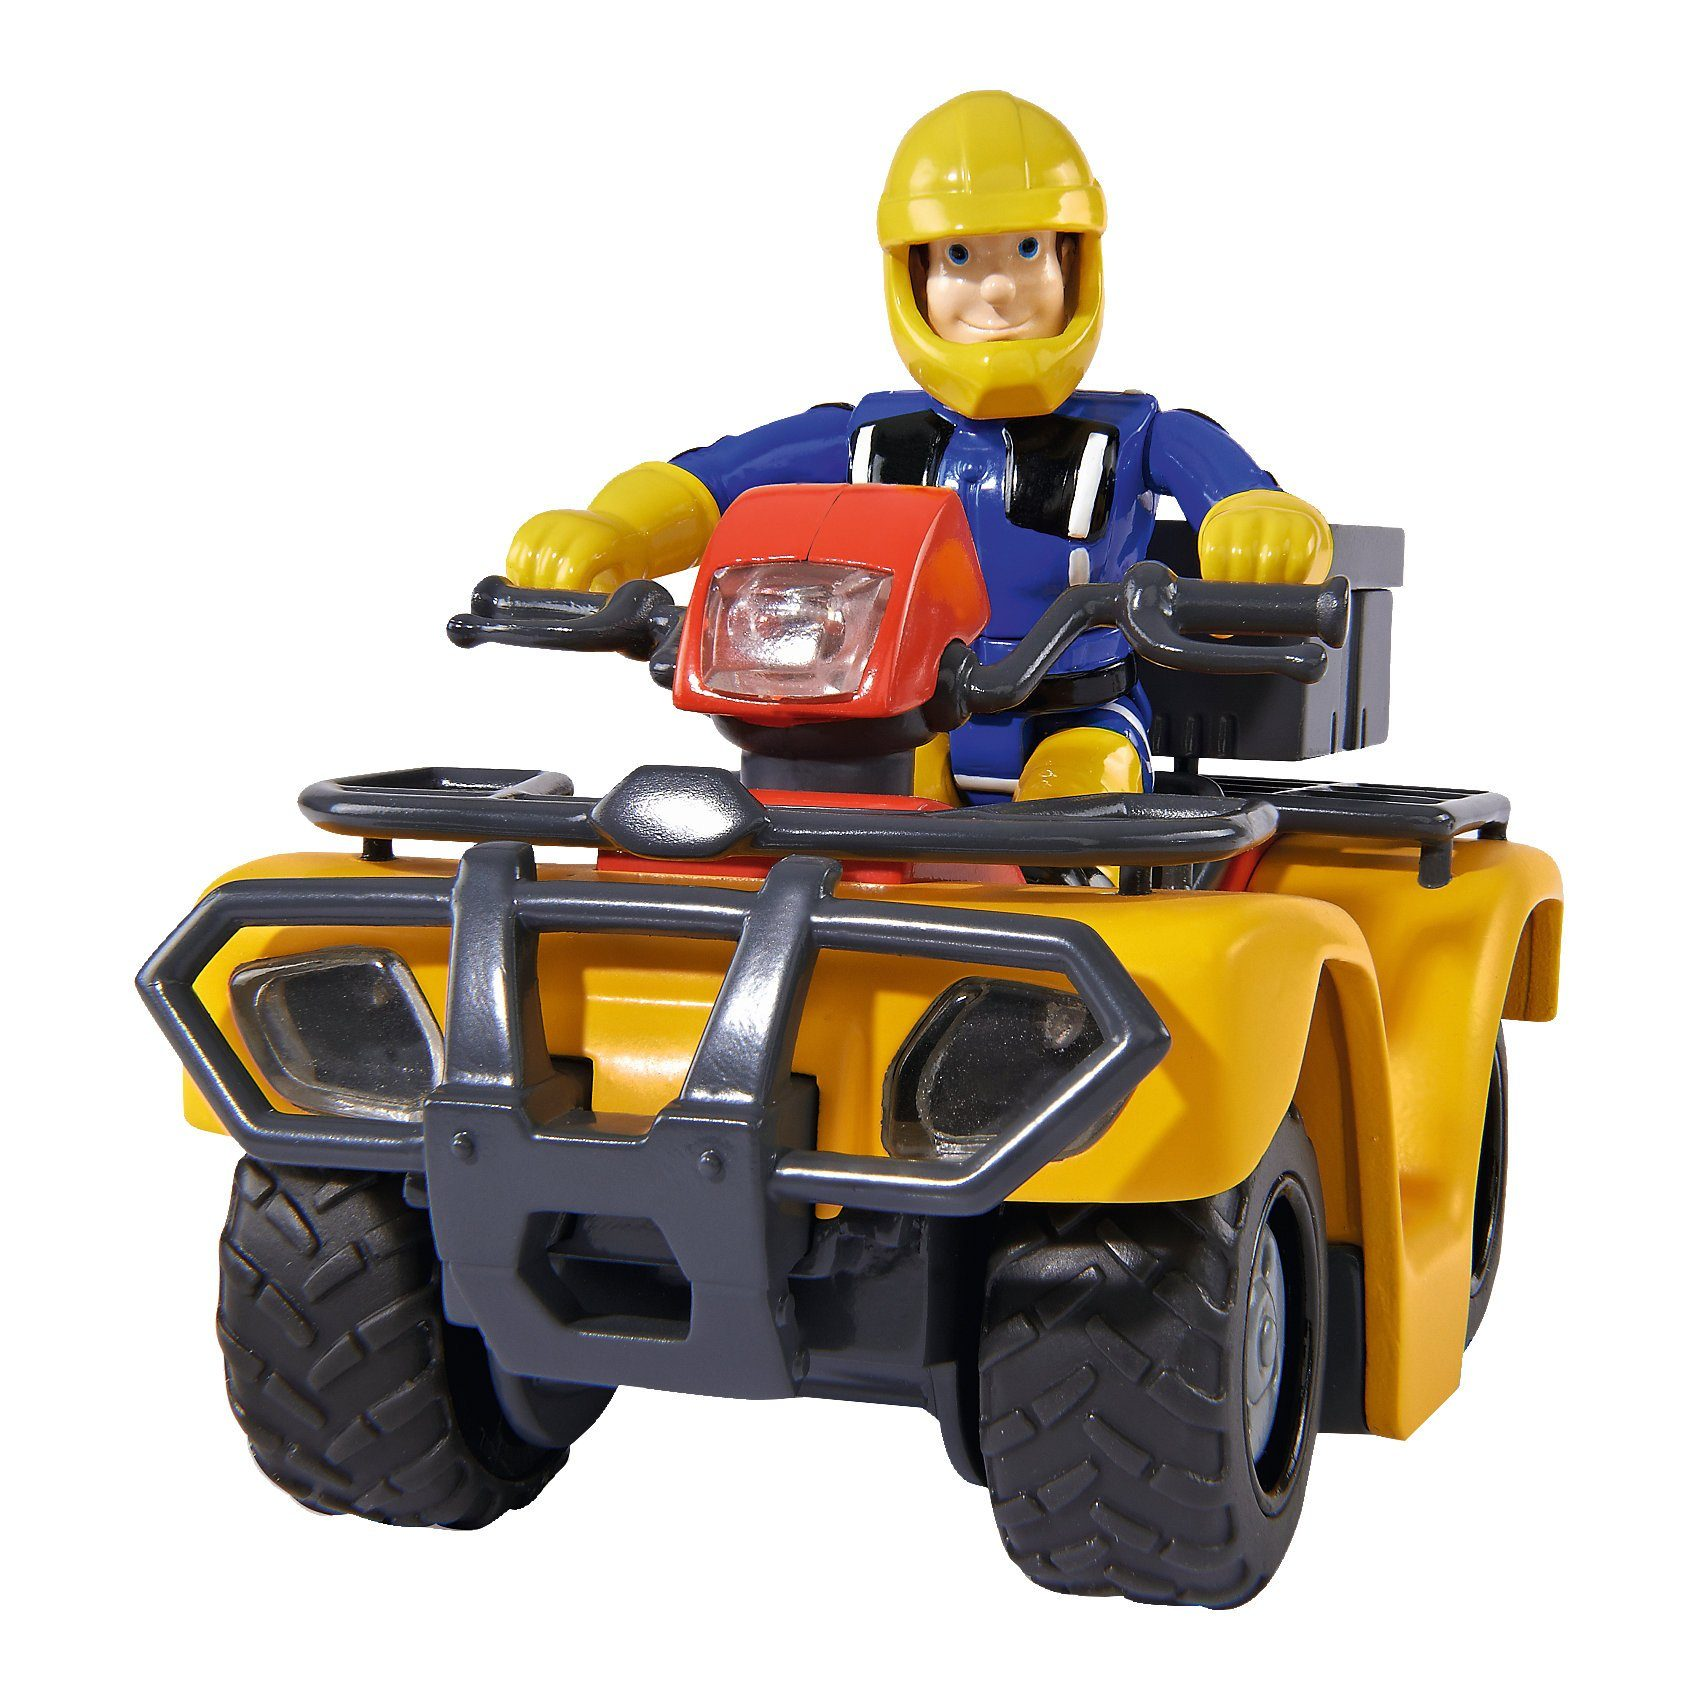 Simba Feuerwehrmann Sam Mercury-Quad mit Figur